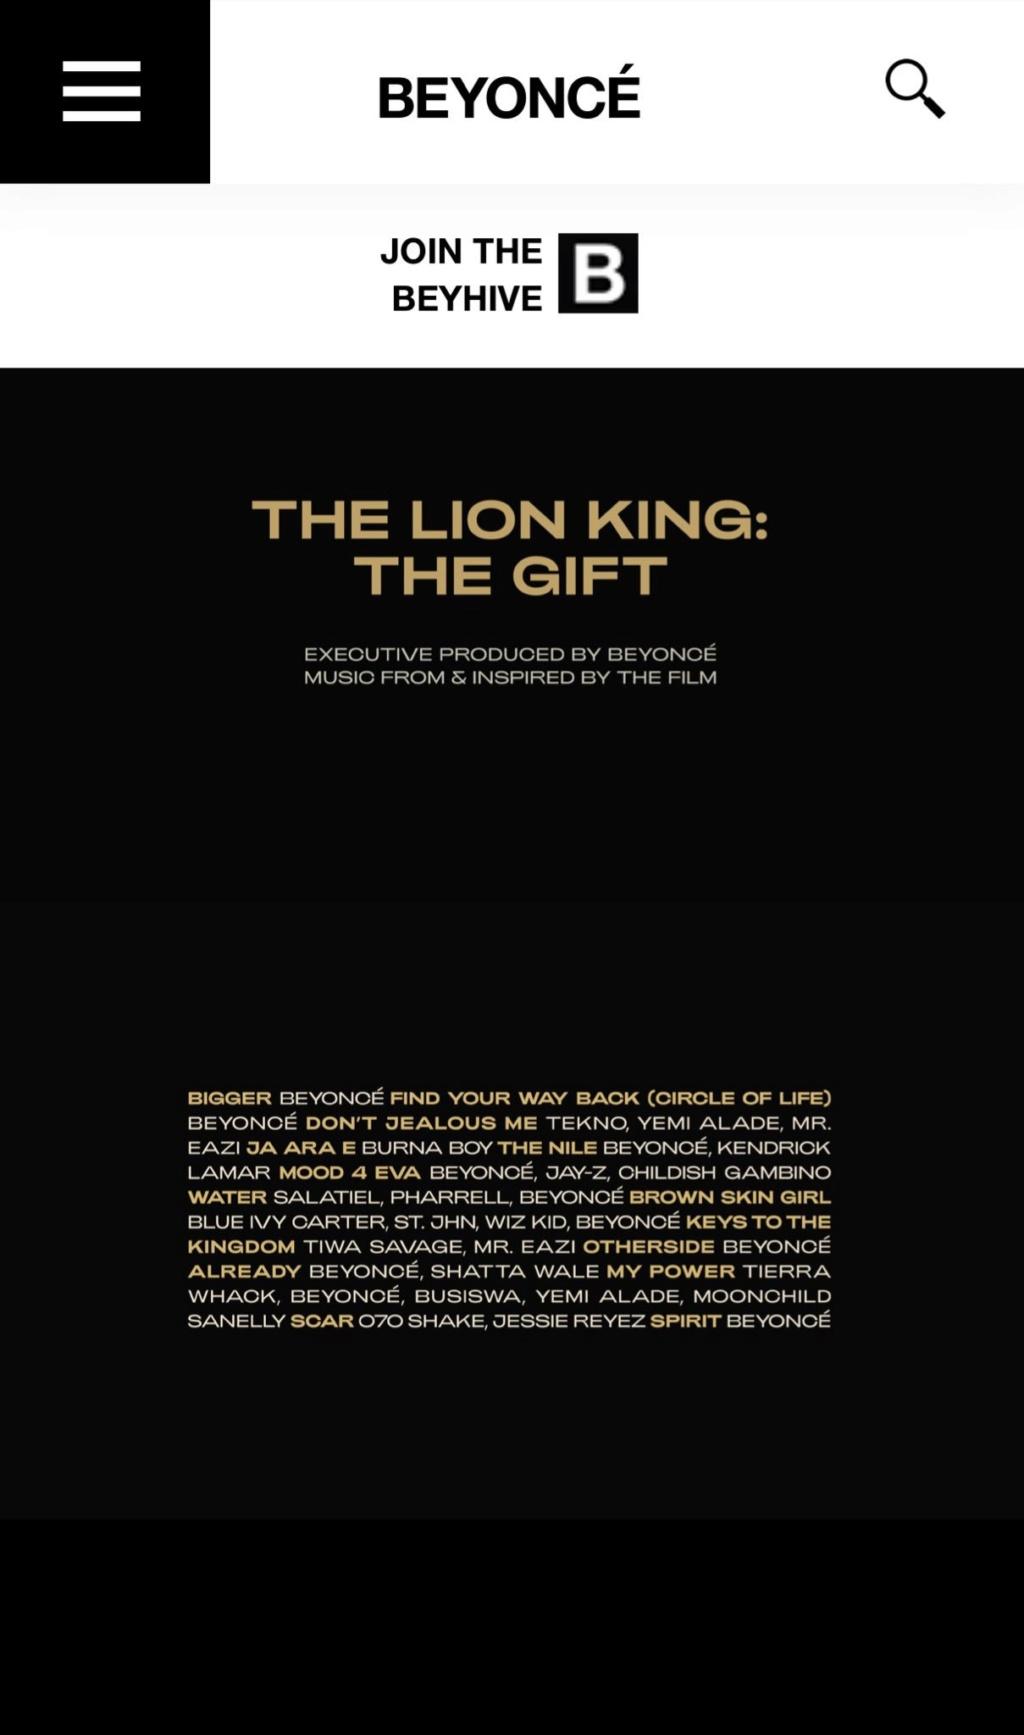 Beyoncé >> preparando nuevo álbum - Página 12 Img_2166